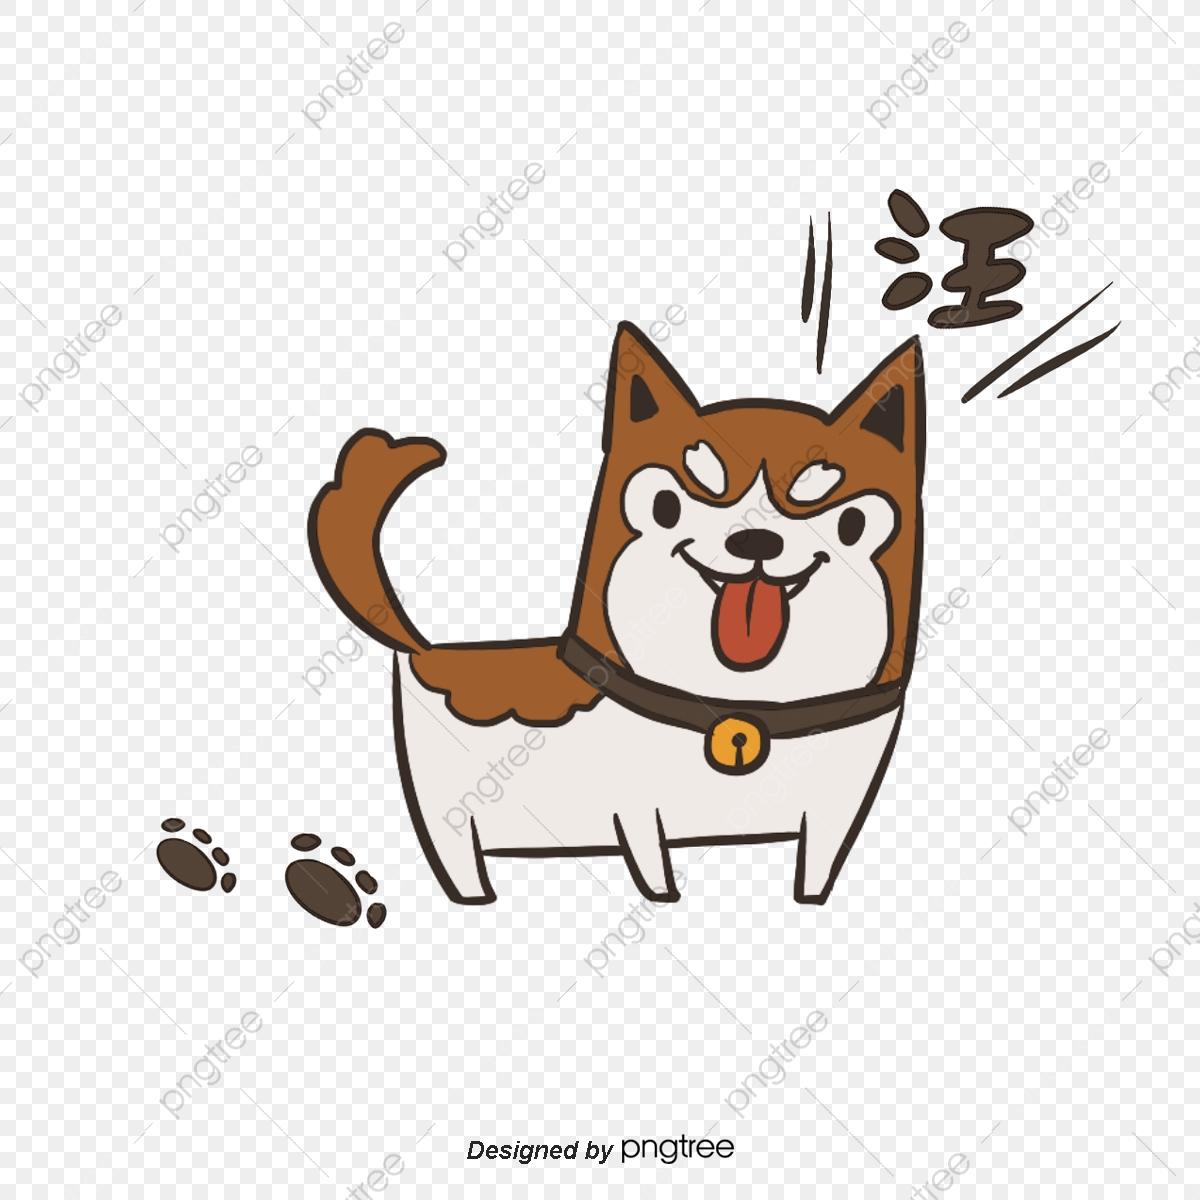 Pet clipart single animal. Cute puppy element dog